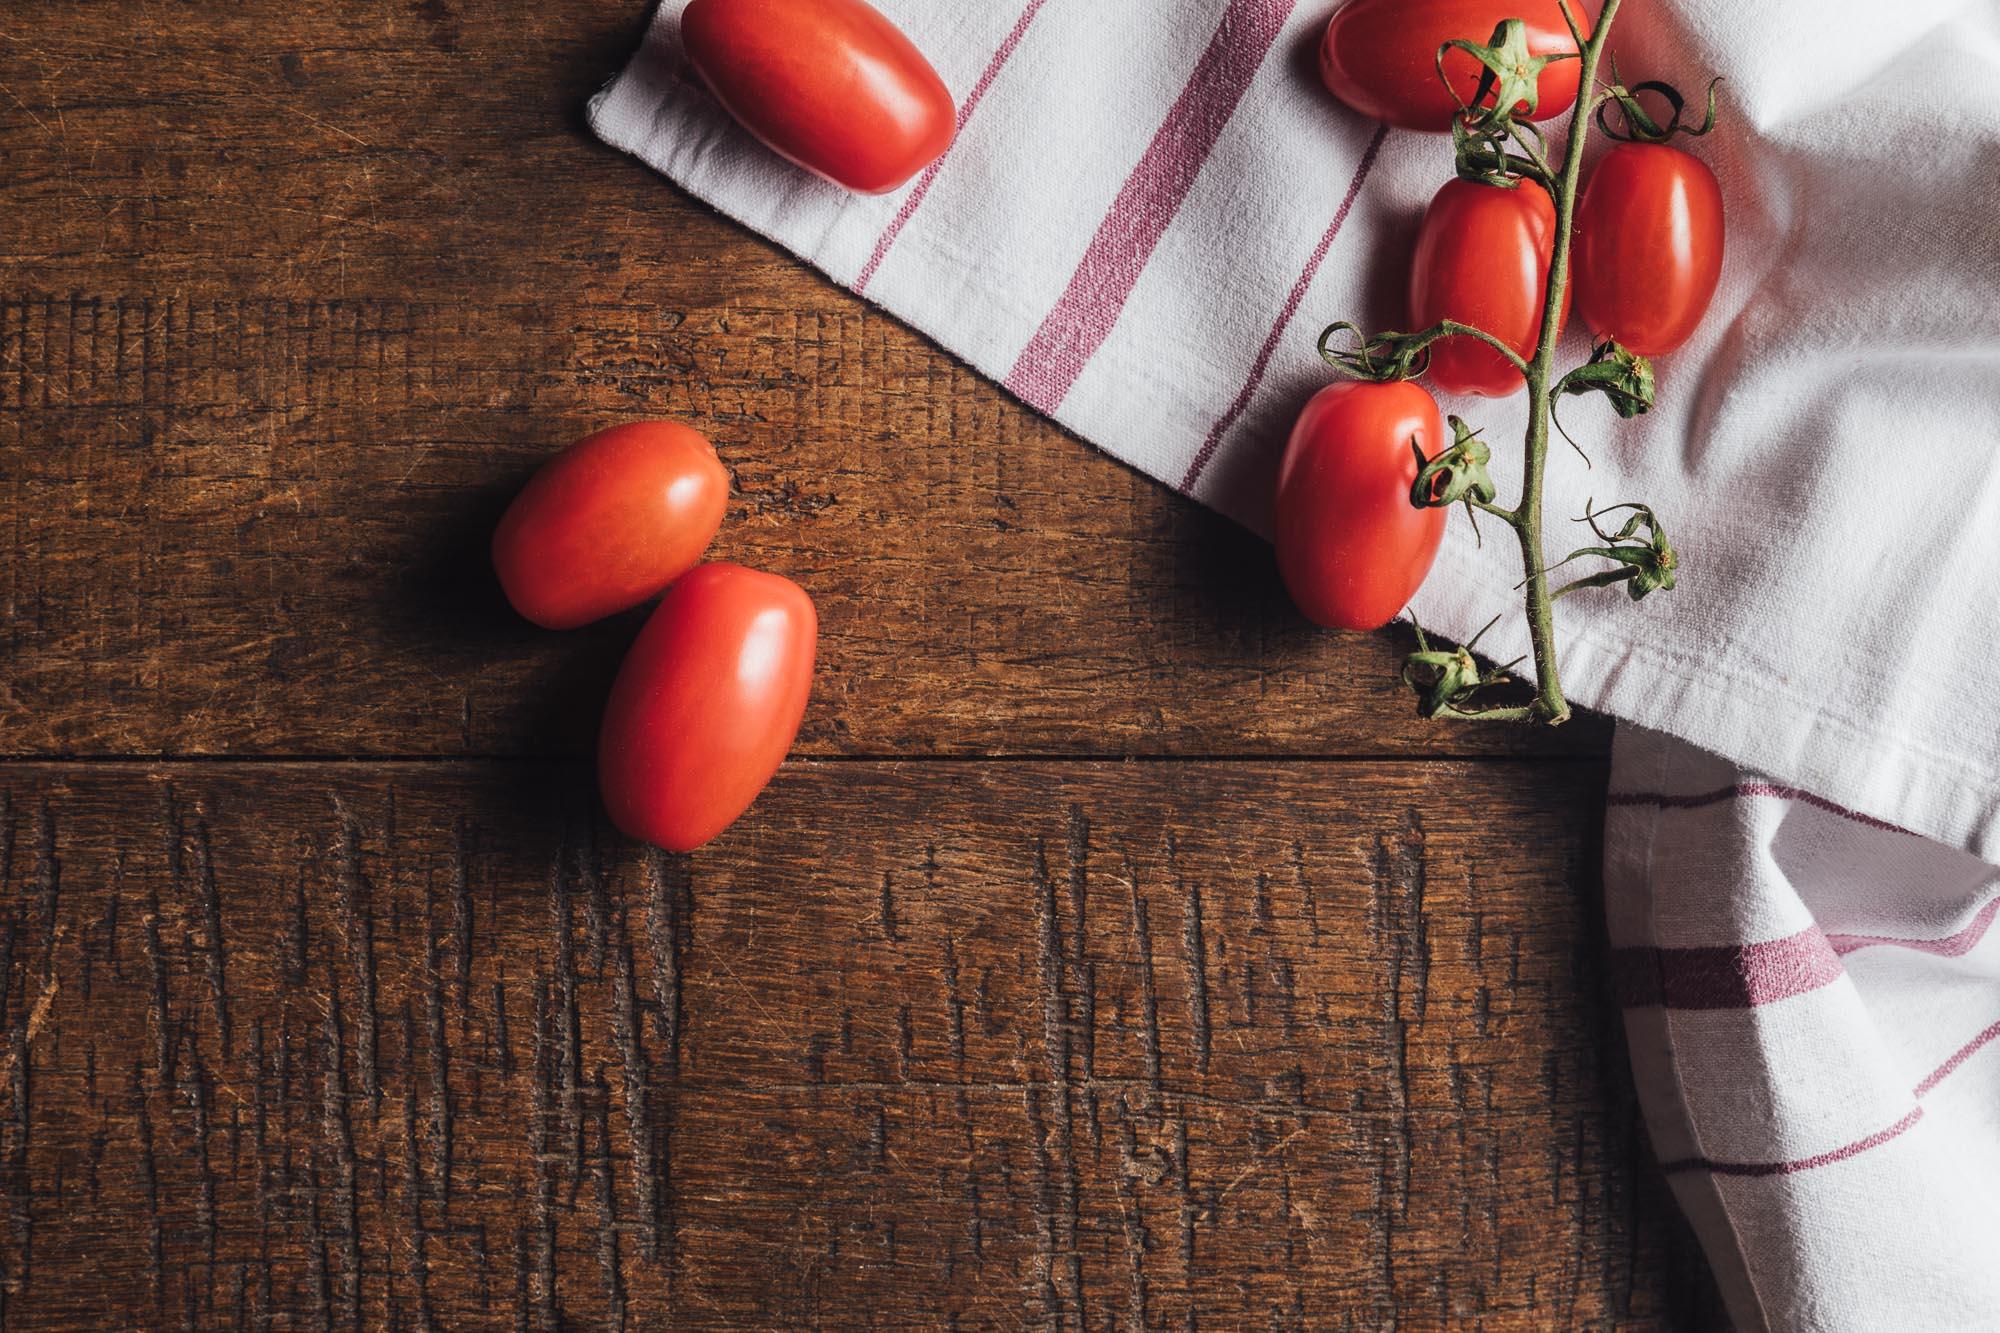 Marzanino Tomatoes Esposito Neapolitan Pizza Oakman Inns.jpg